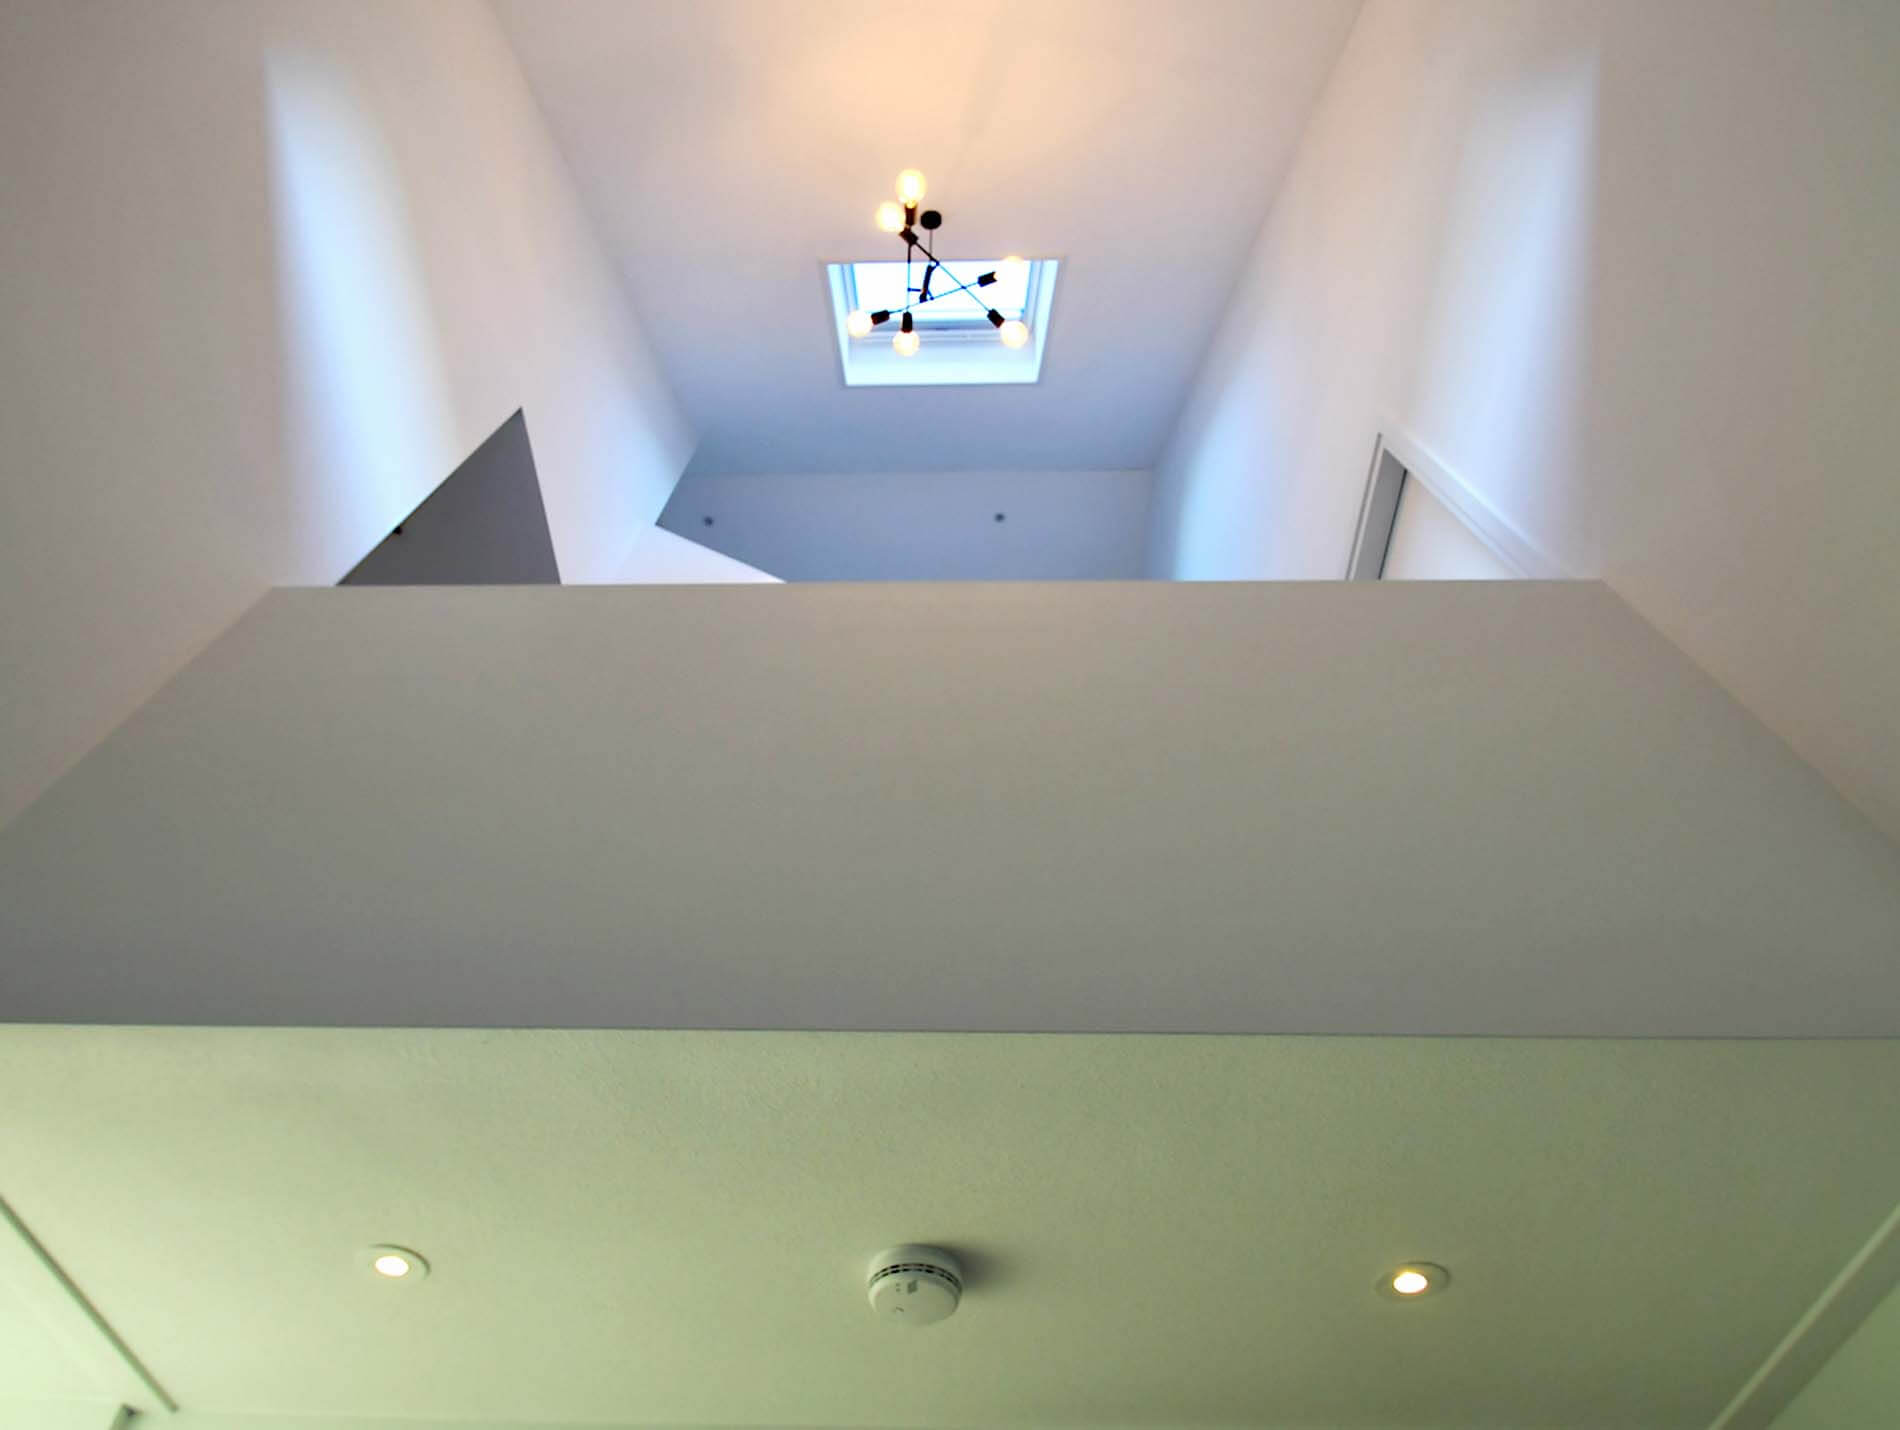 7. Interieur-drachten-nieuwbouw-woning-1900x1430p.jpg